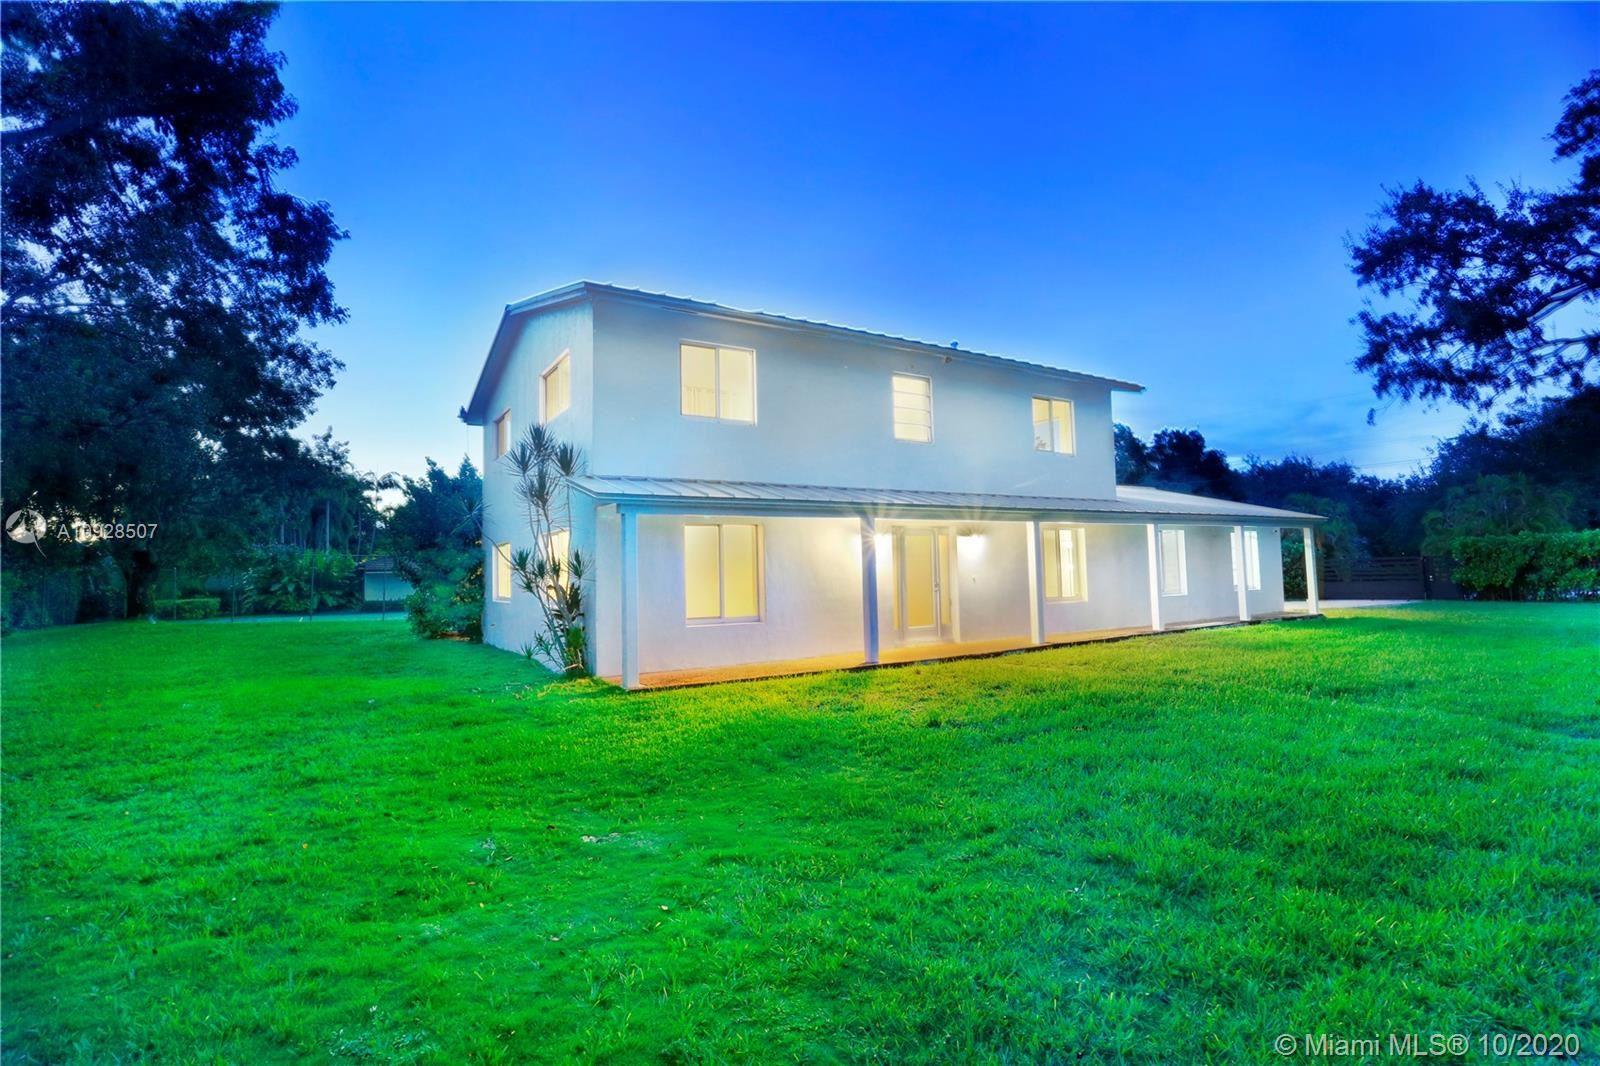 12800 Old Cutler Rd, Pinecrest, FL 33156 - #: A10928507